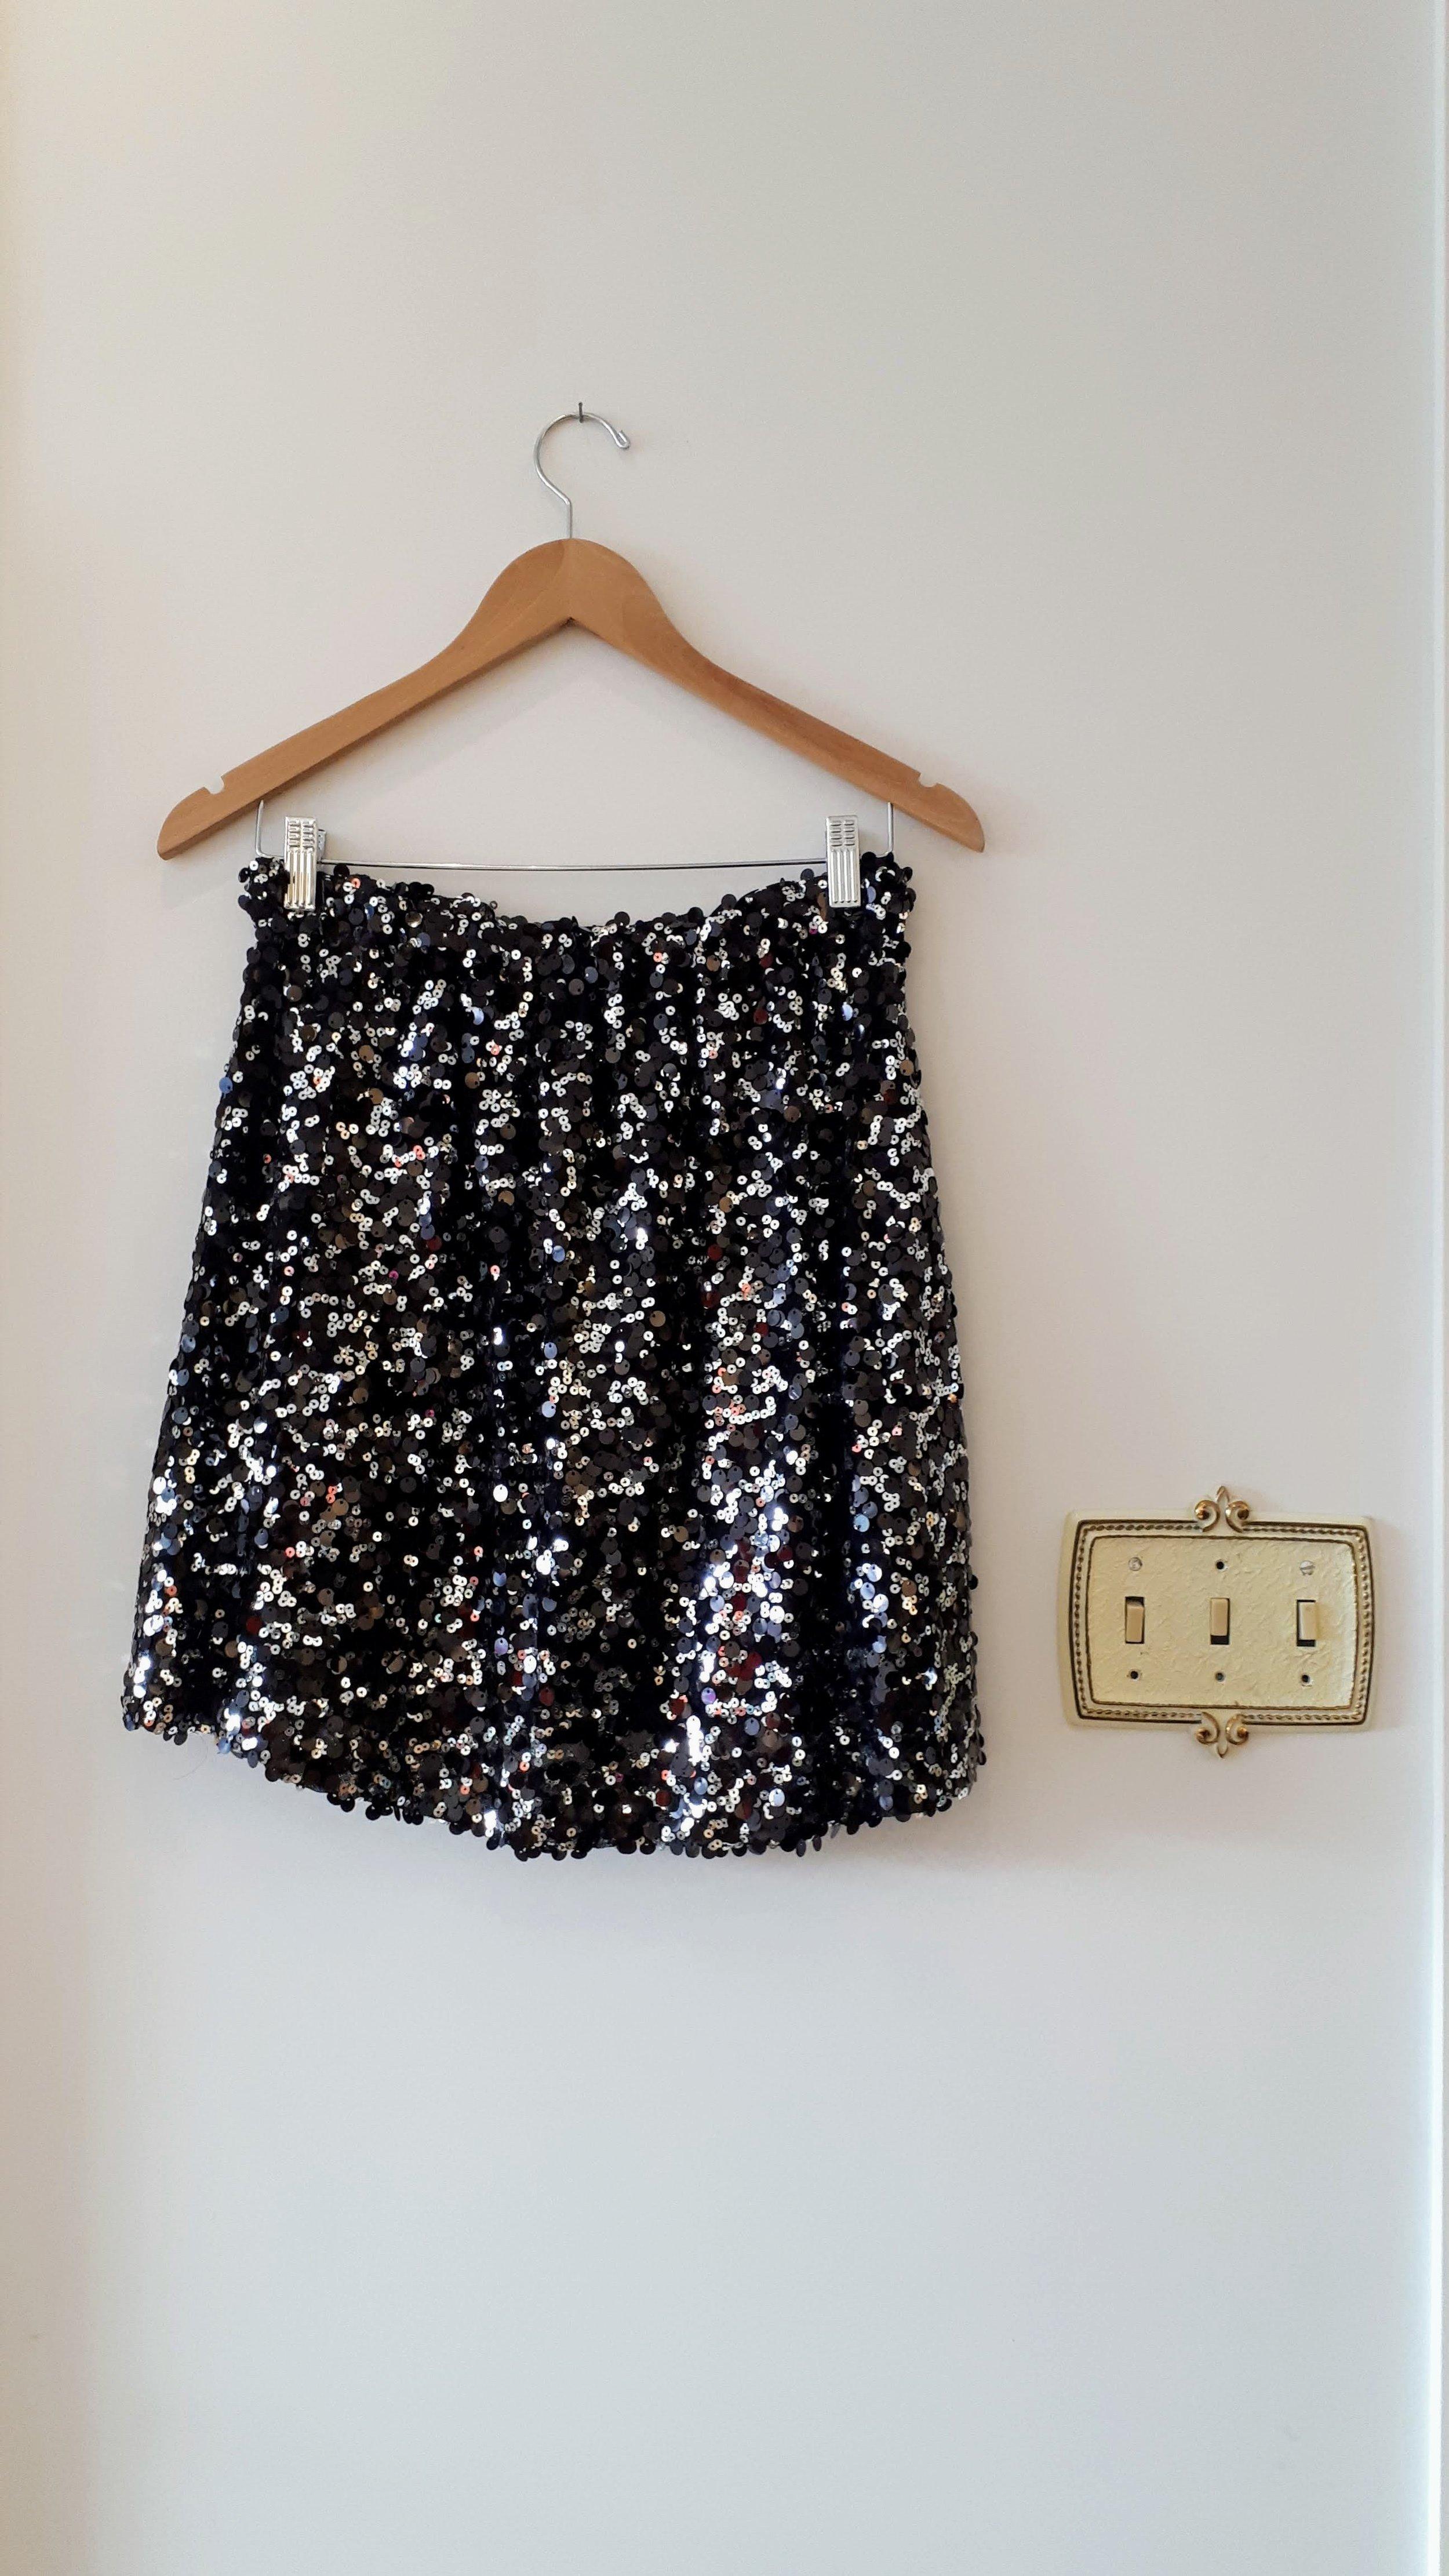 Sequin skirt; Size S, $26